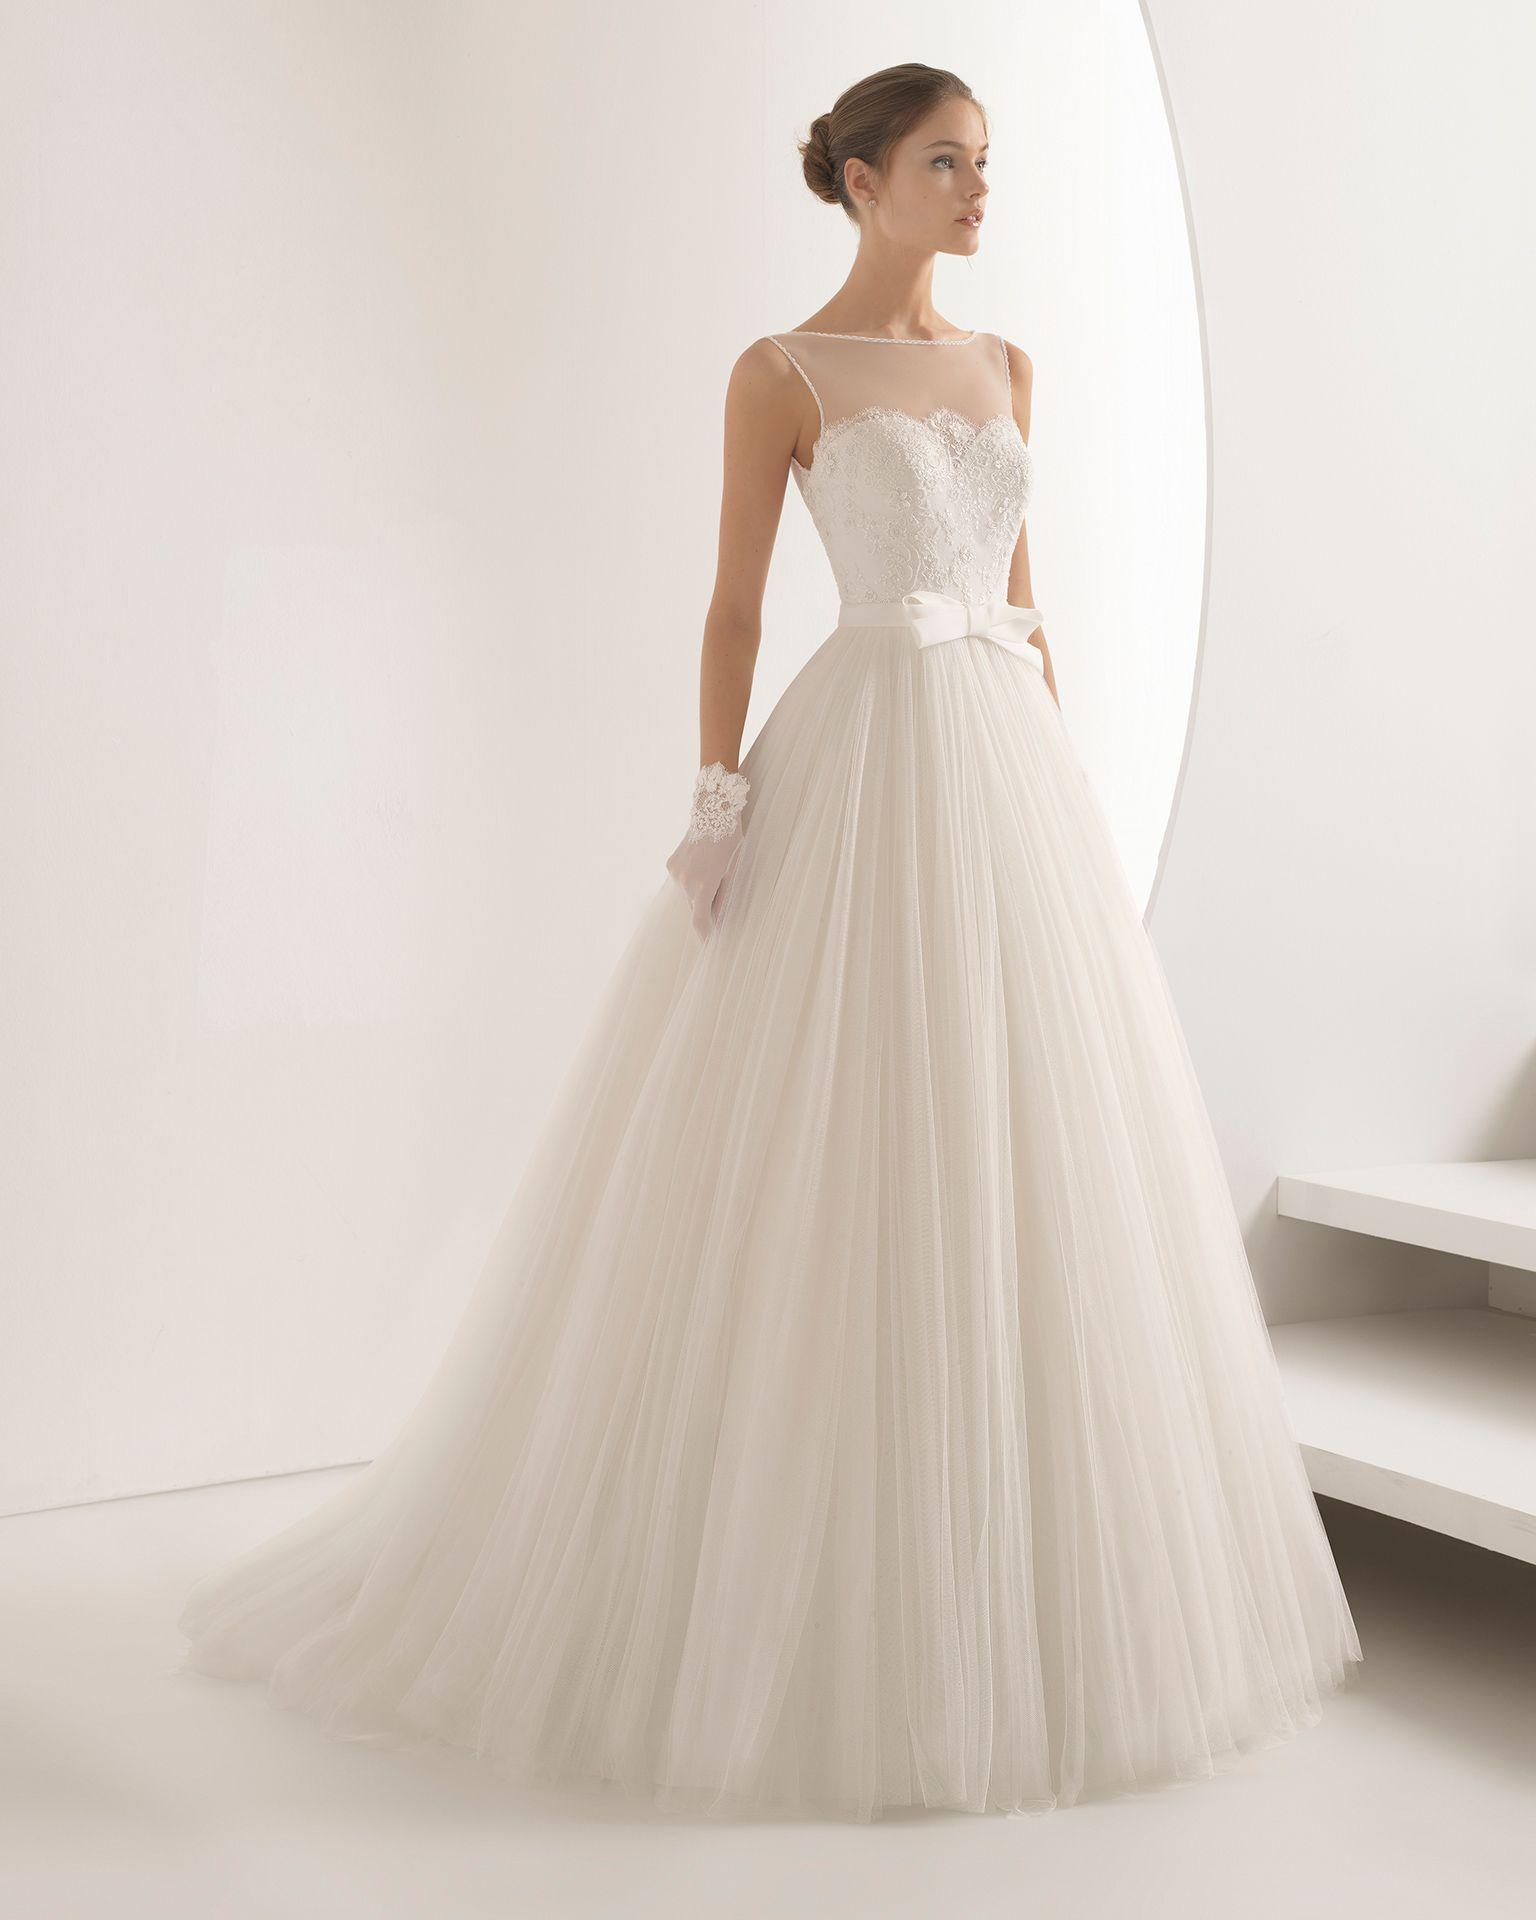 2018_ALBANO_ROSA_CLARA_1.jpg (1536×1920) | Wedding dress2 ...